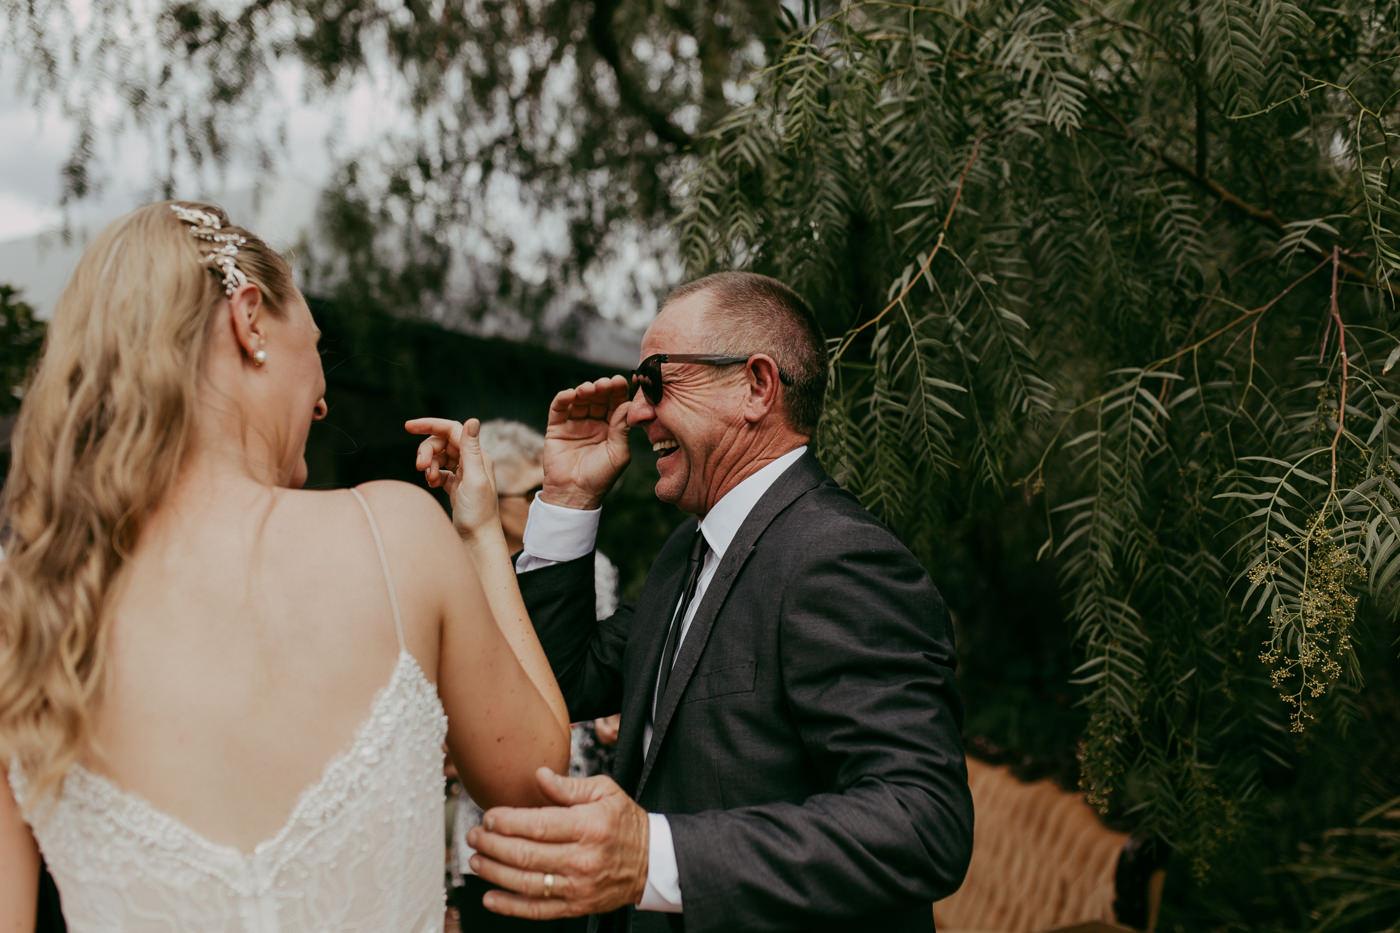 Anthony & Eliet - Wagga Wagga Wedding - Country NSW - Samantha Heather Photography-114.jpg